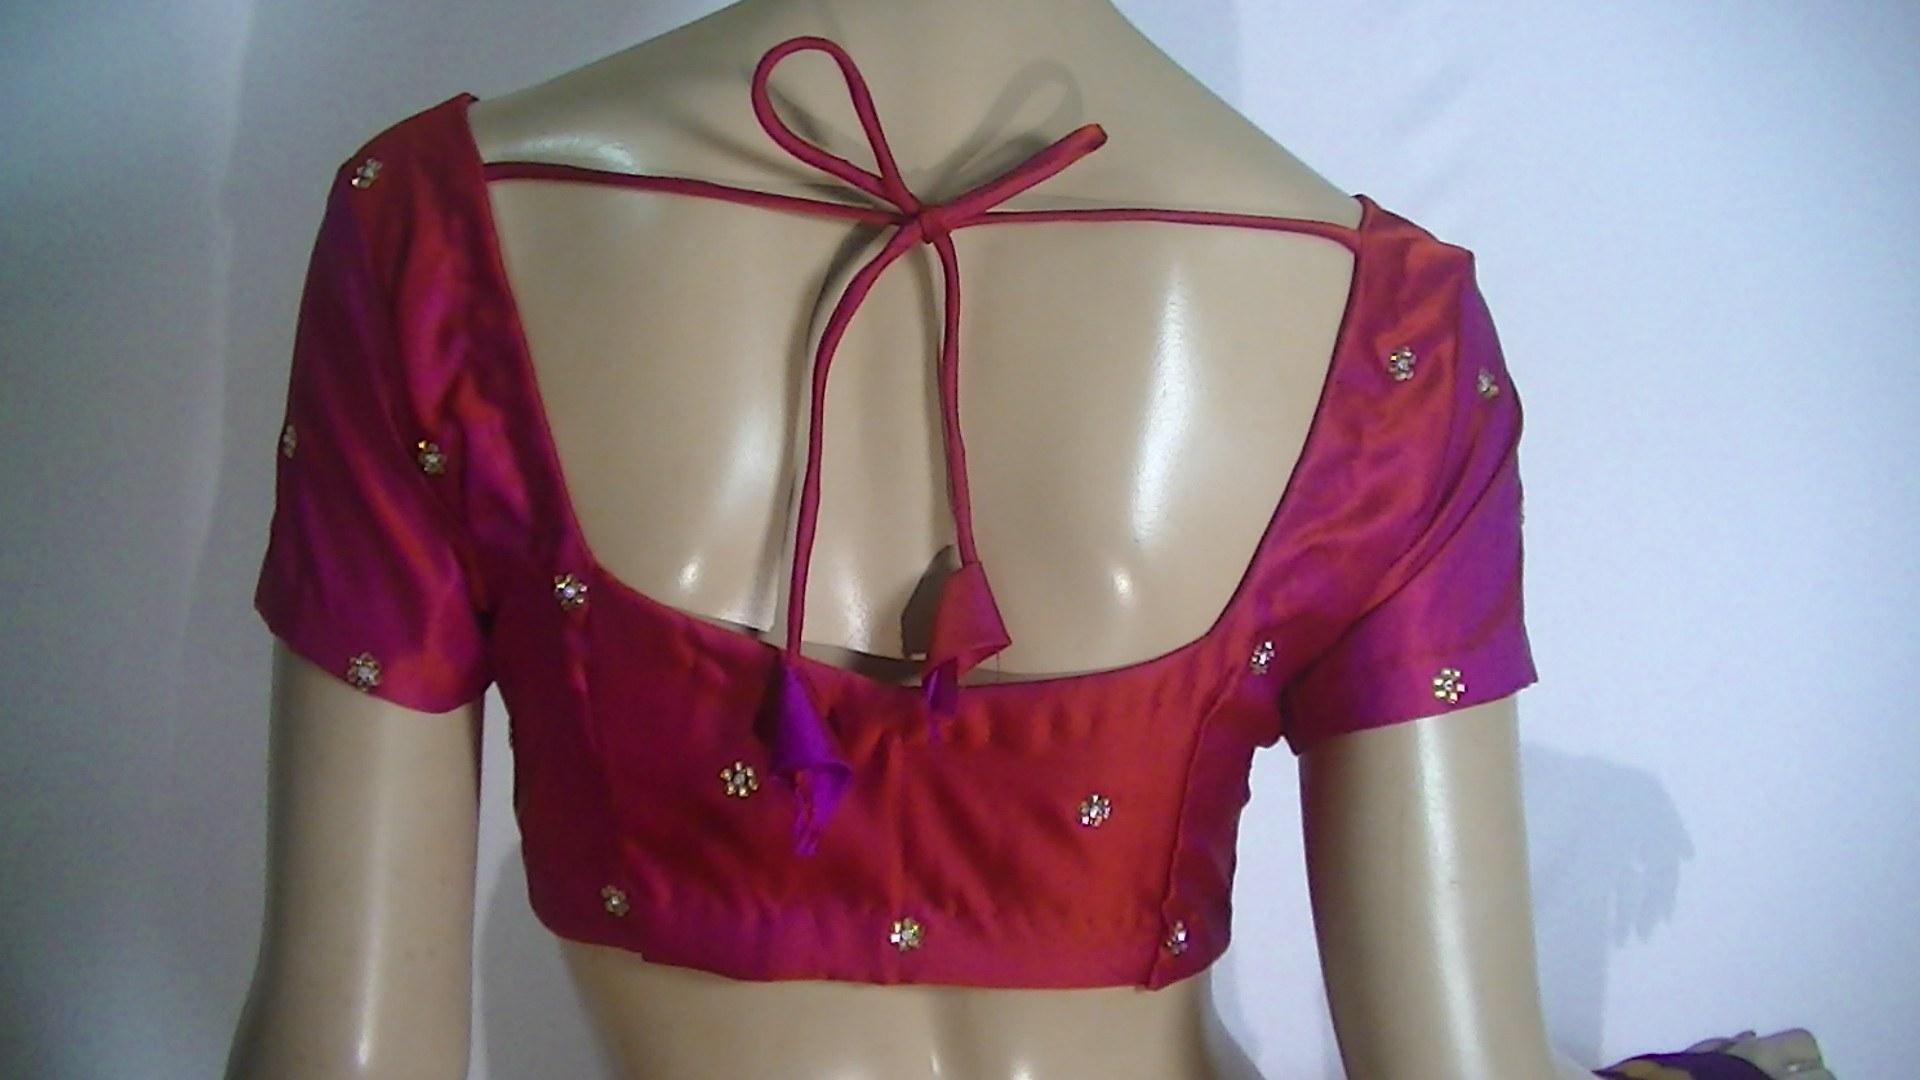 readymade blouse online shopping in chennai silk pintuck blouse readymade blouse online shopping in chennai 84